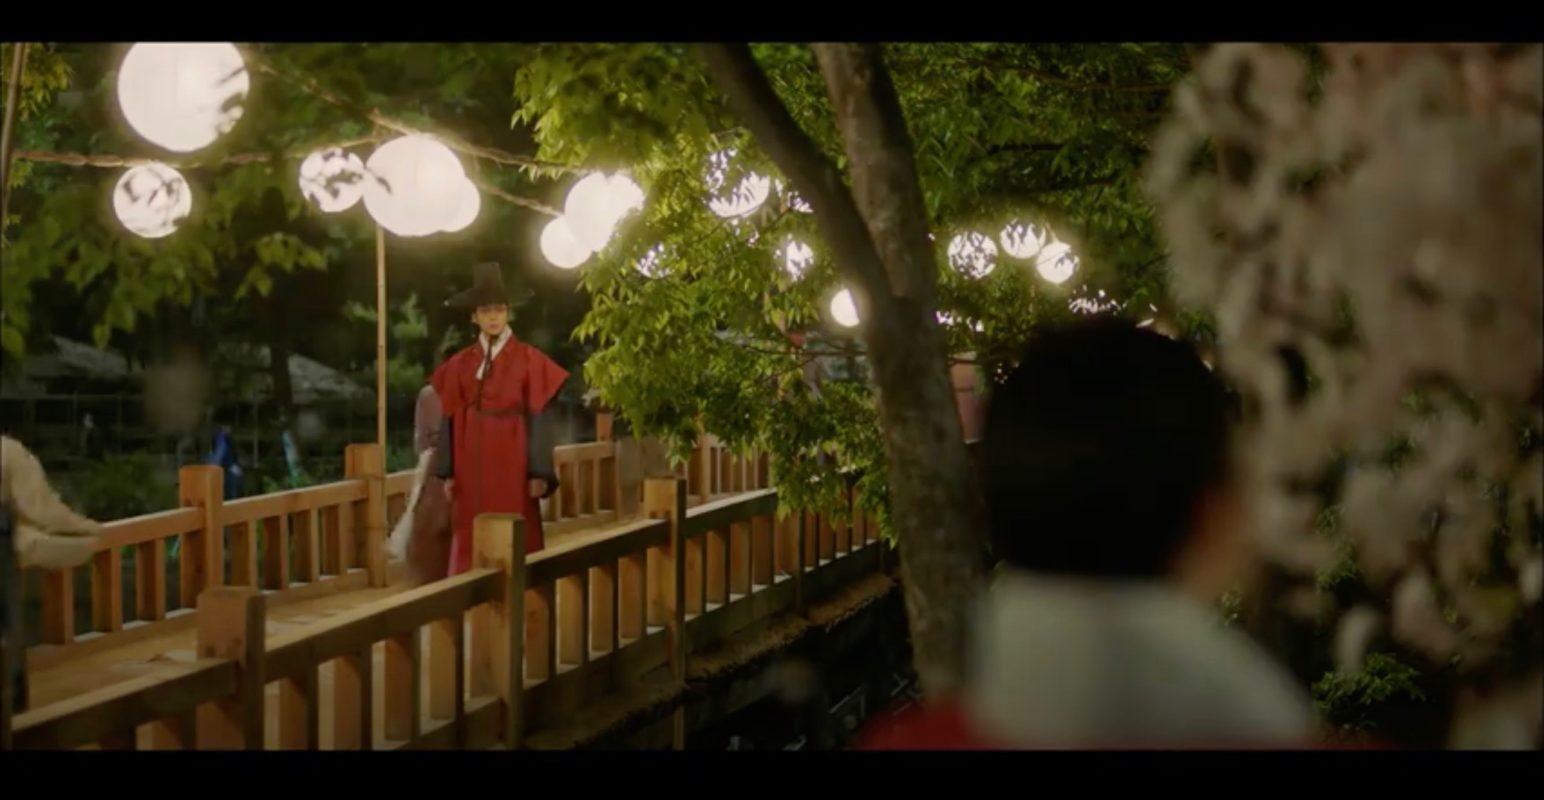 movie korea seven years of night 2018 subtitle indonesia